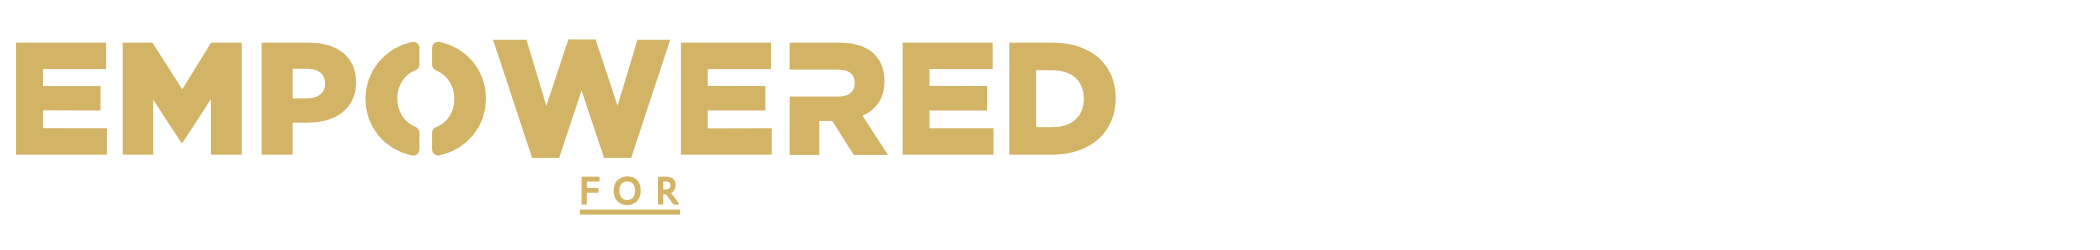 Empowered Empire